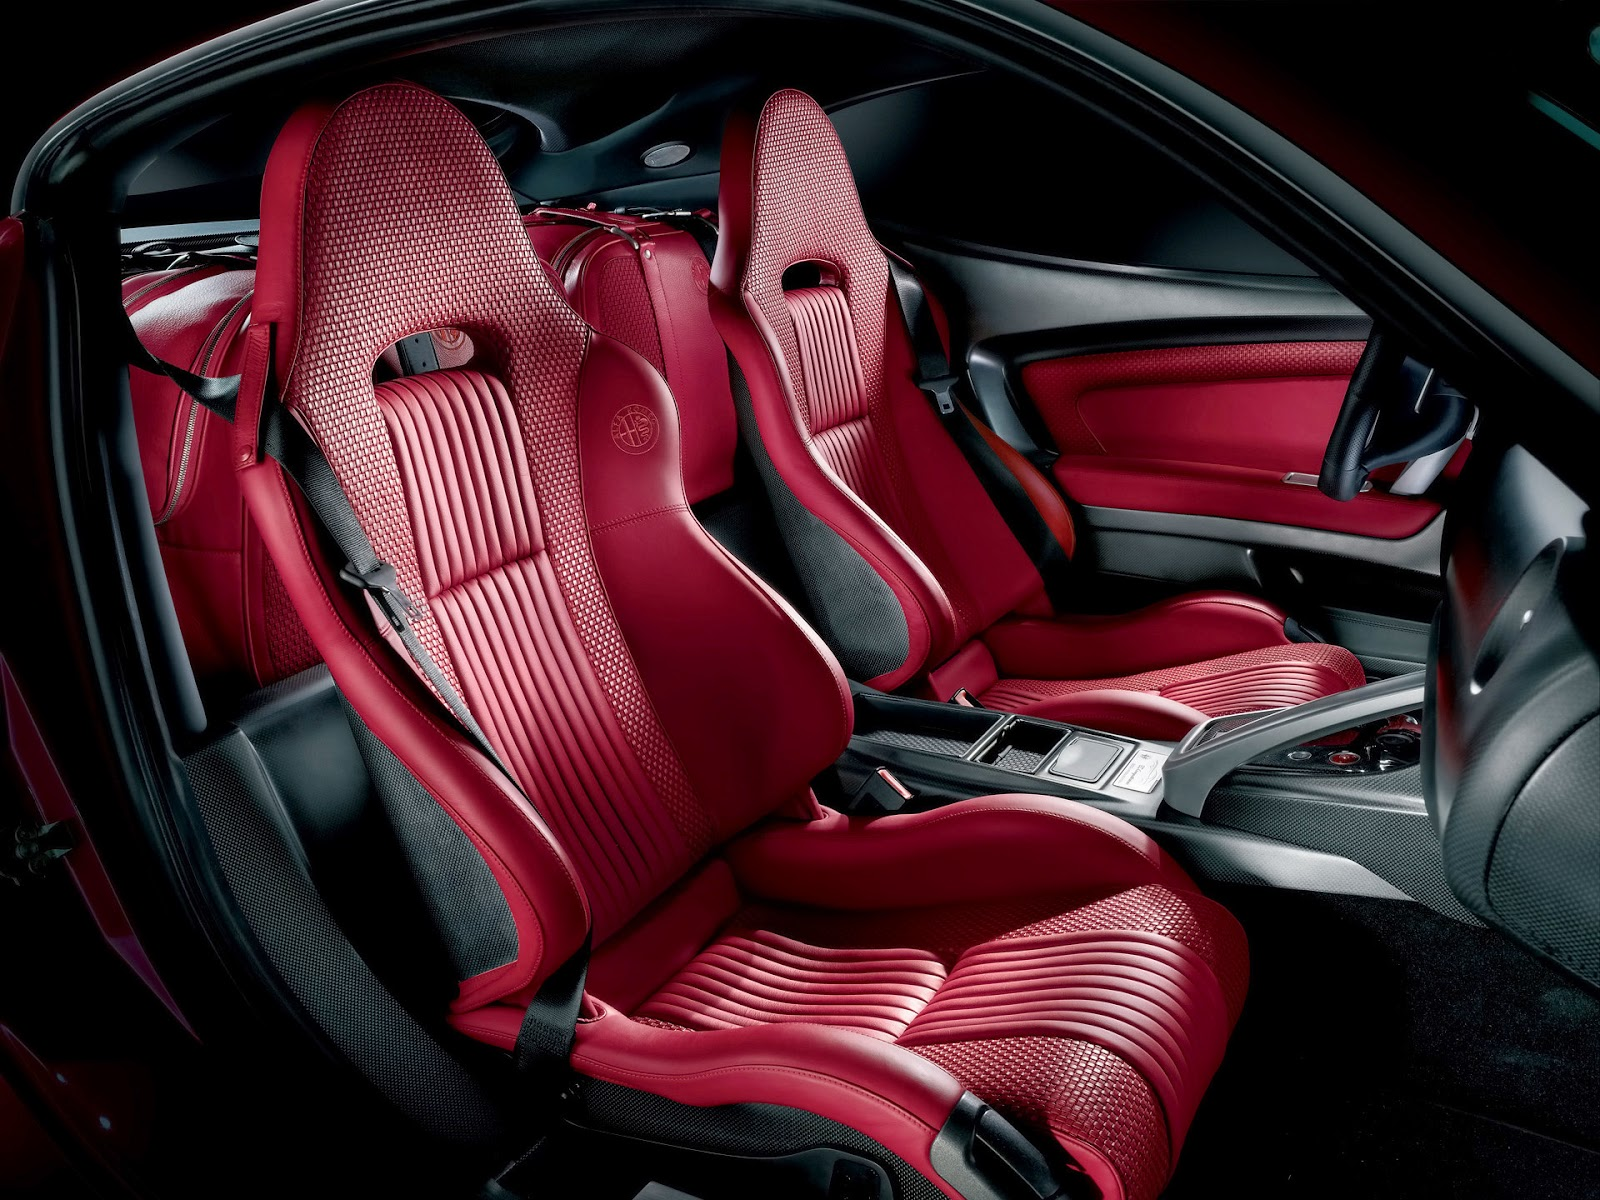 Alfa Romeo Interior | The Car Club